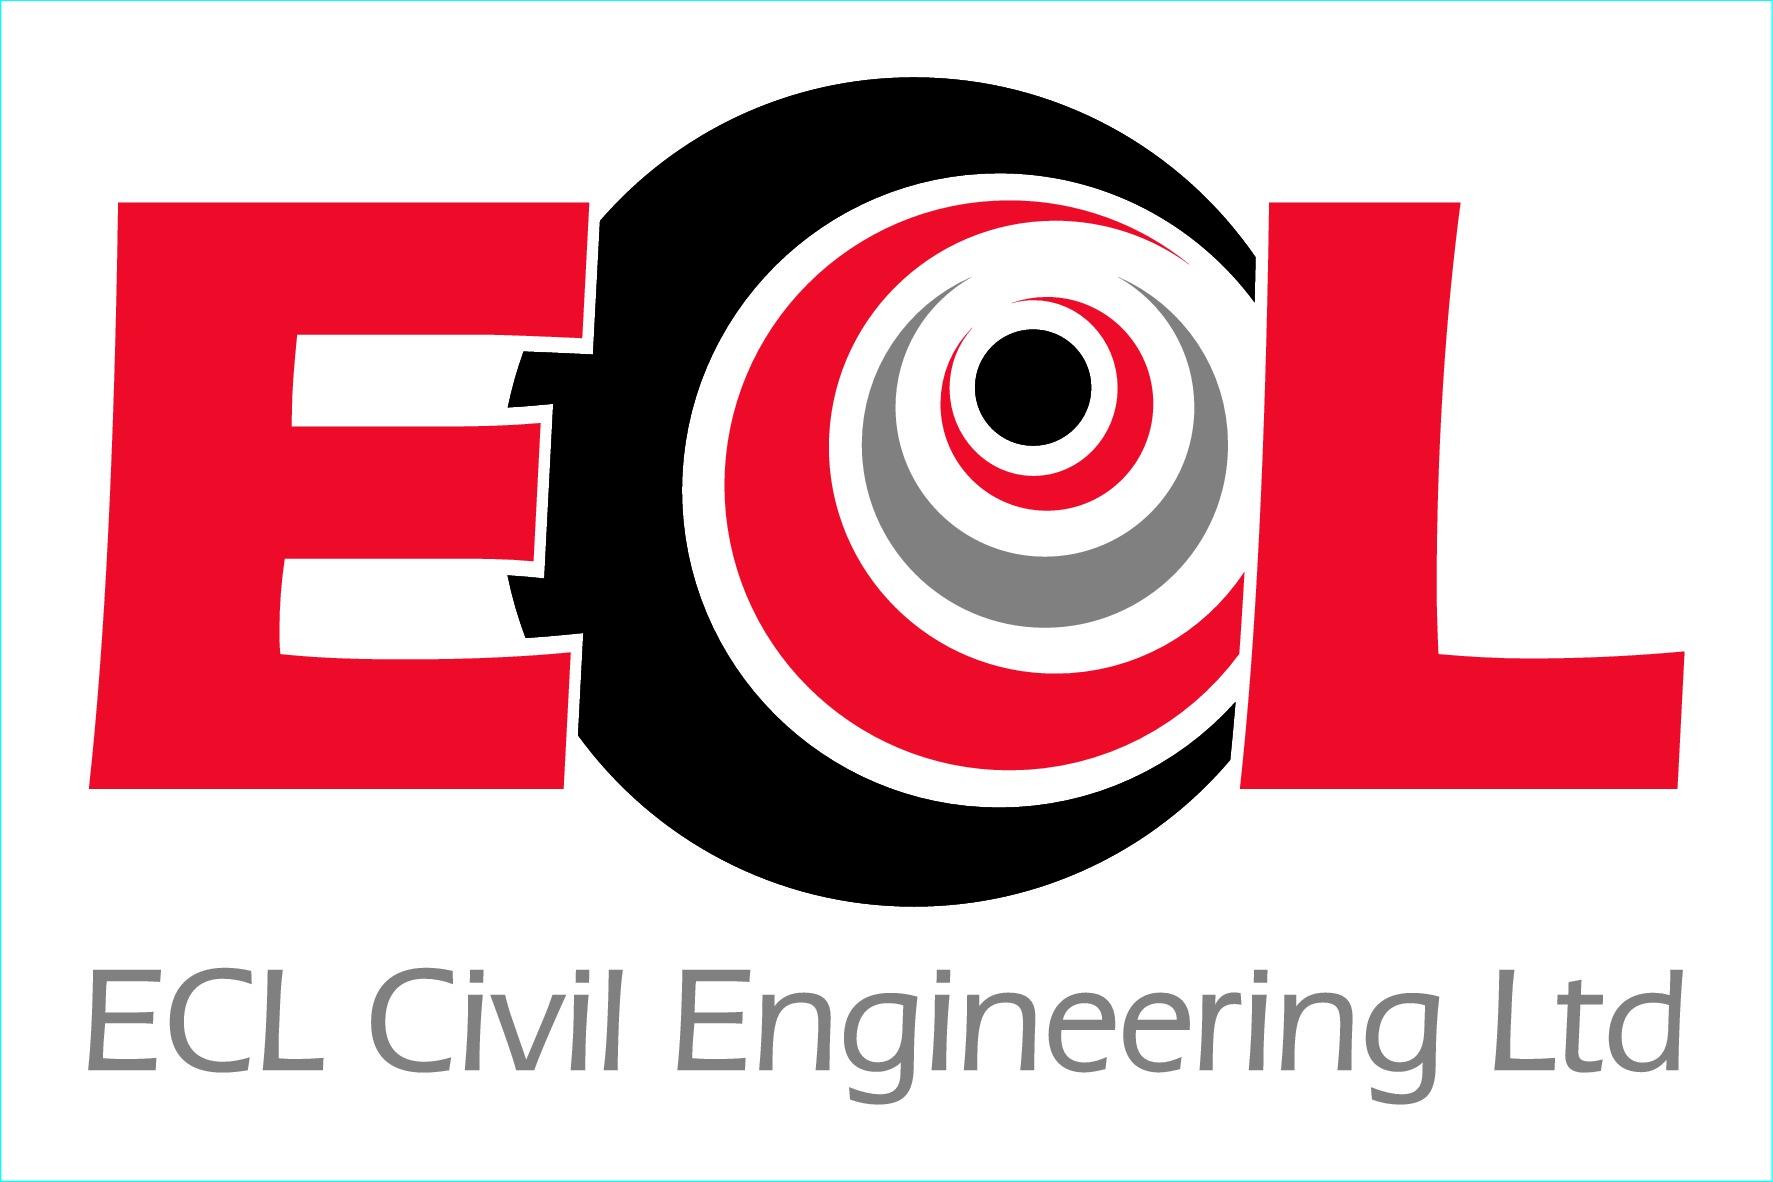 ECL_logo corrected format.jpg